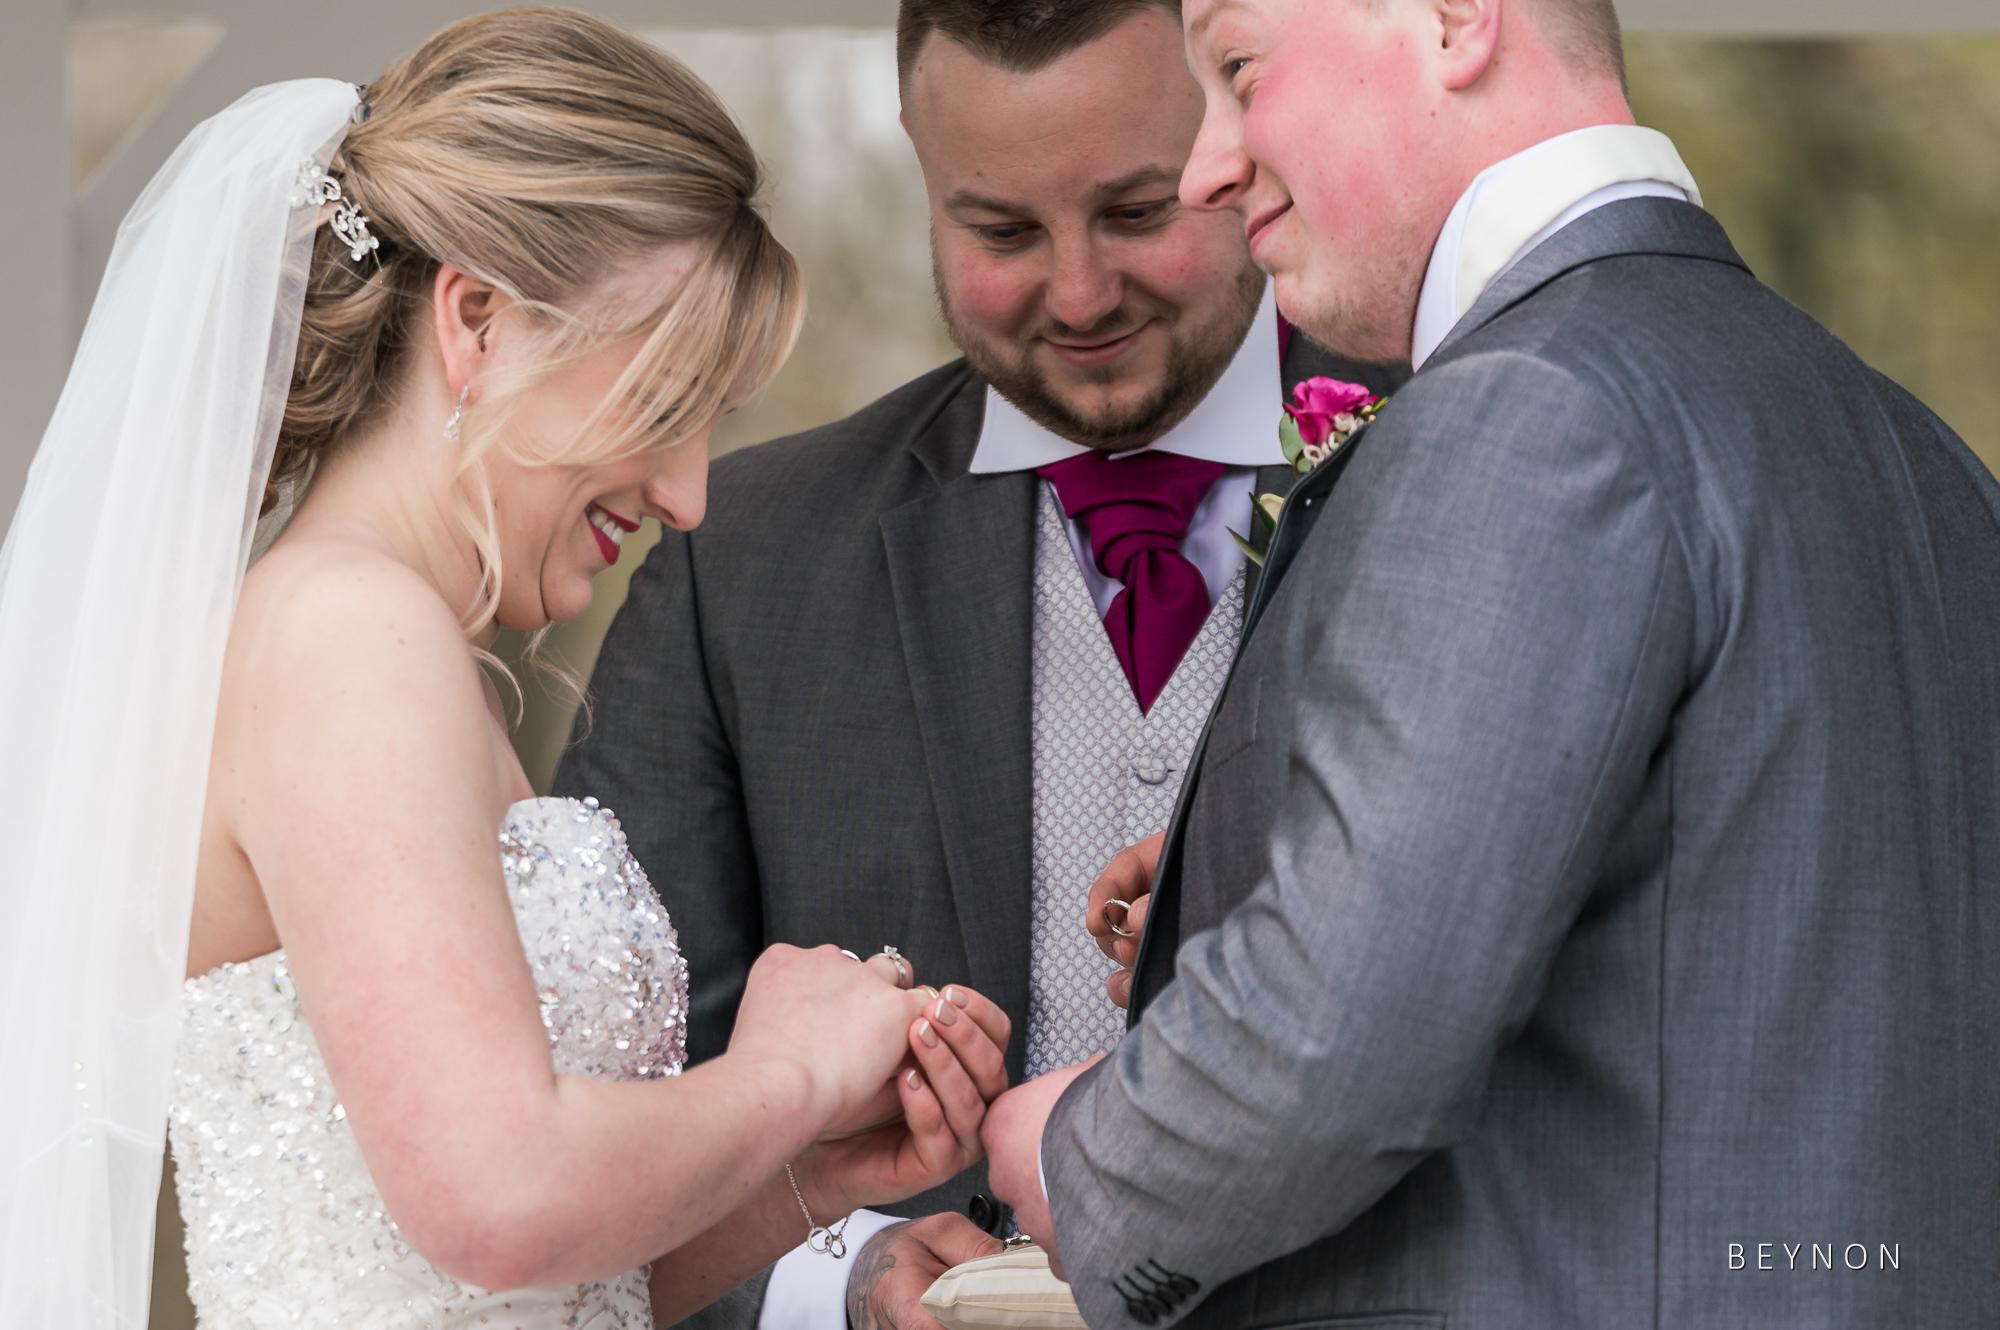 Wedding ring goes on